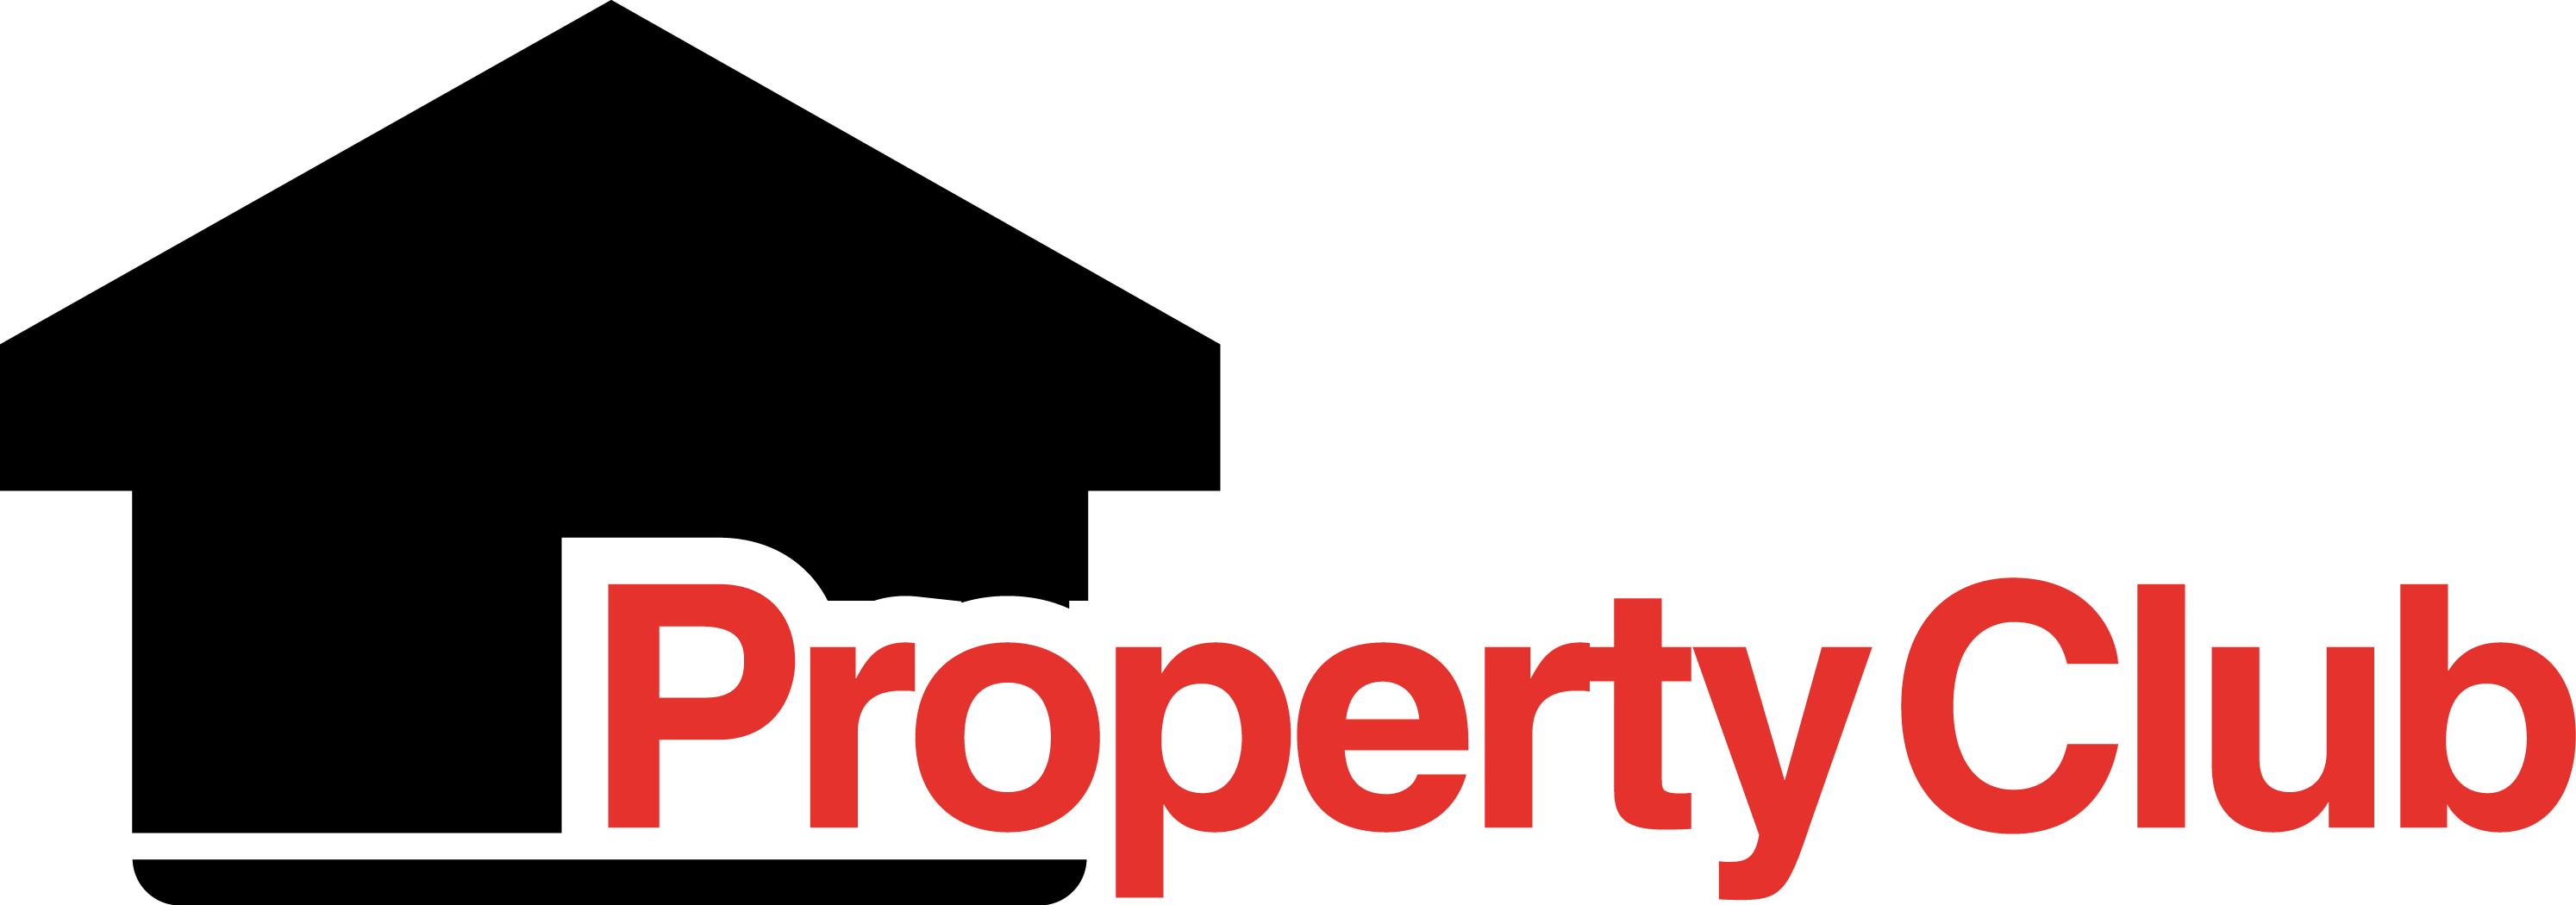 PC Logo - Jan. 2014.png (3)